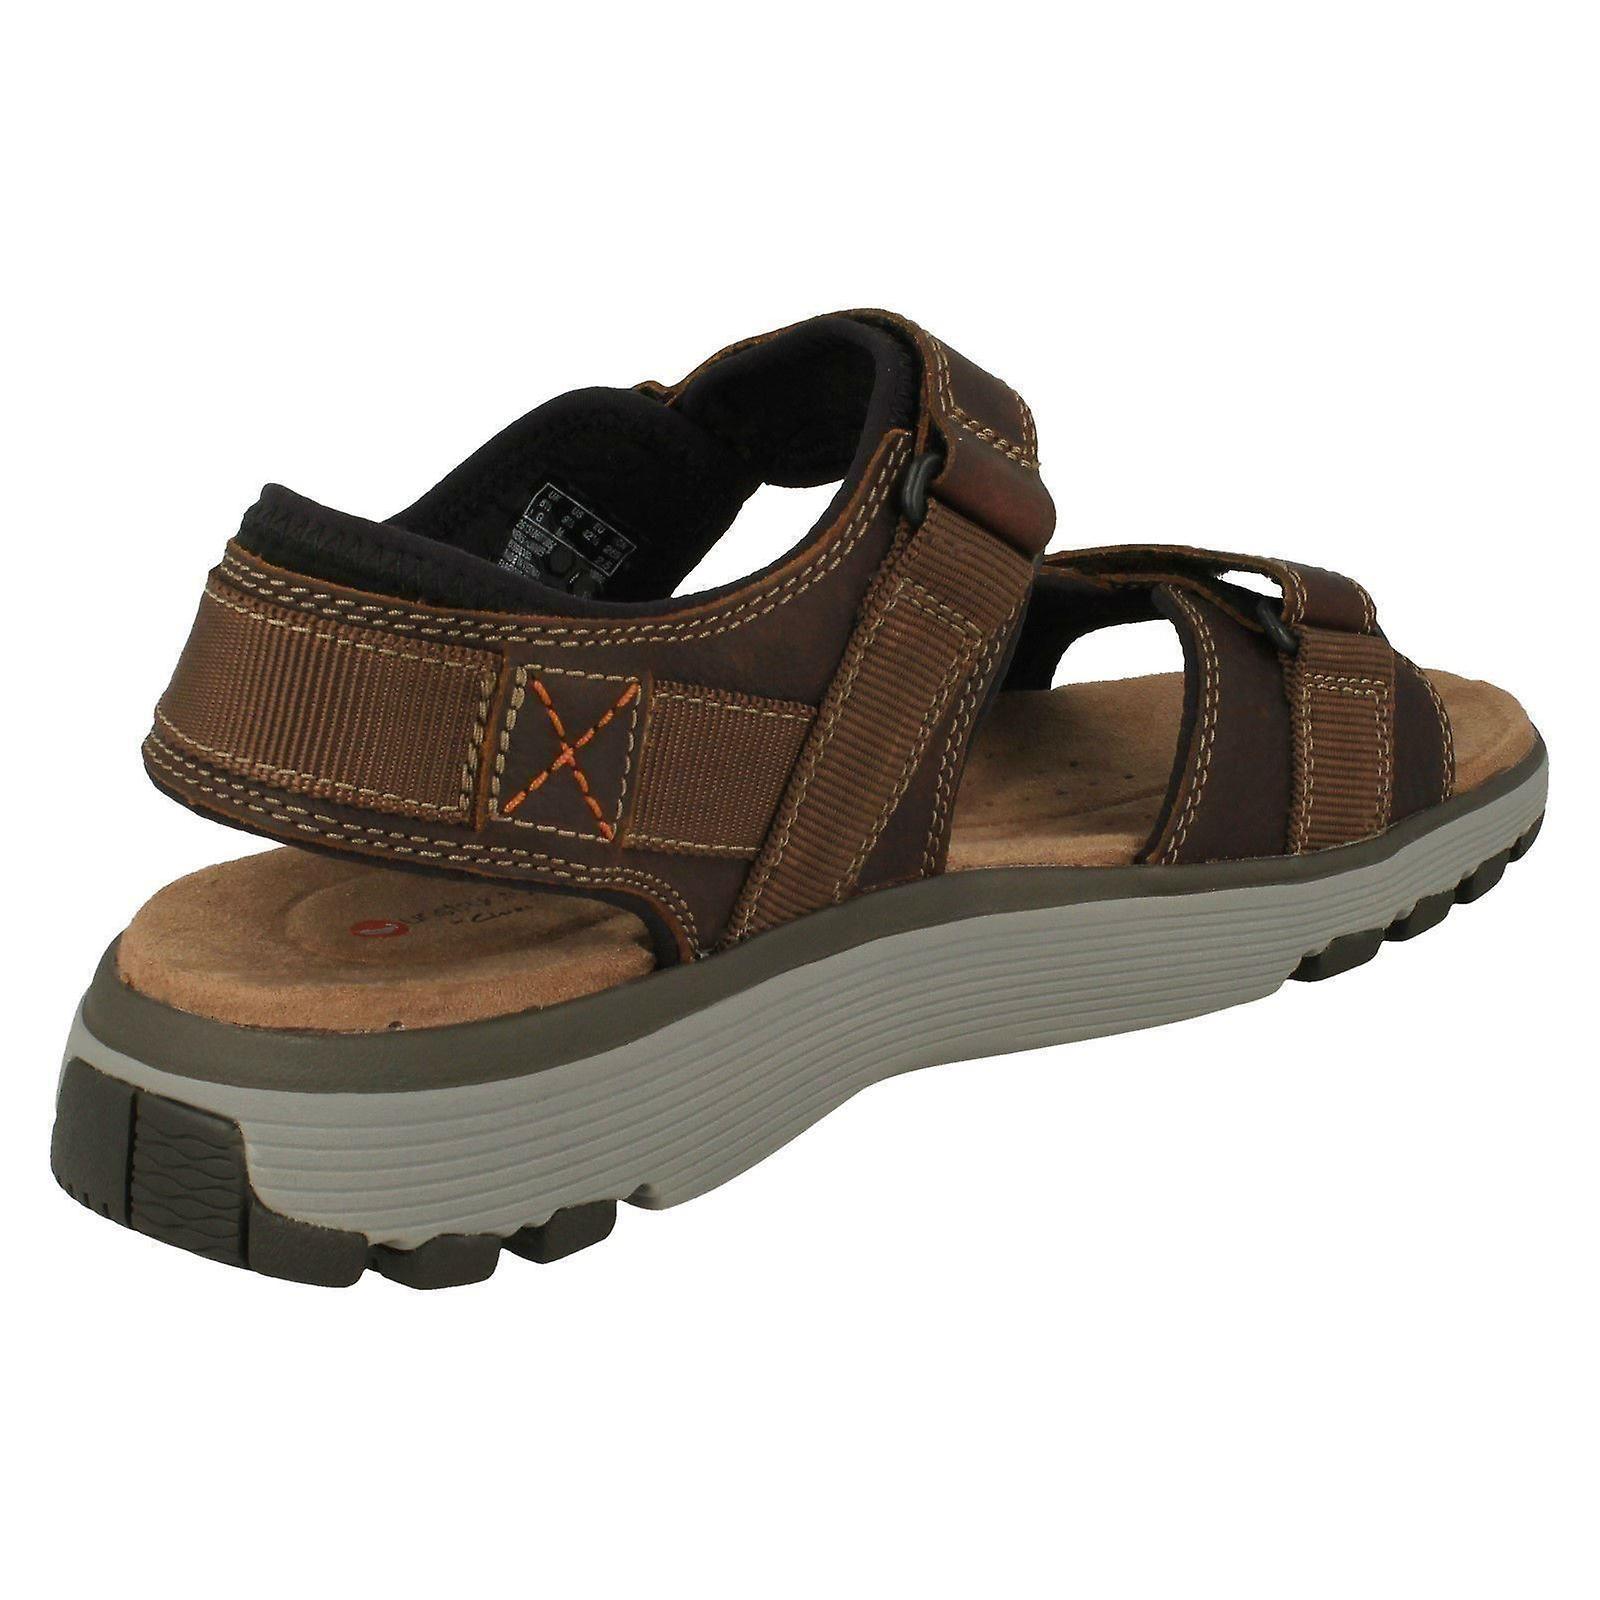 70e7a47606 Mens Clarks Casual Strapped Sandals Un Trek Part - Dark Tan Leather - UK  Size 11G